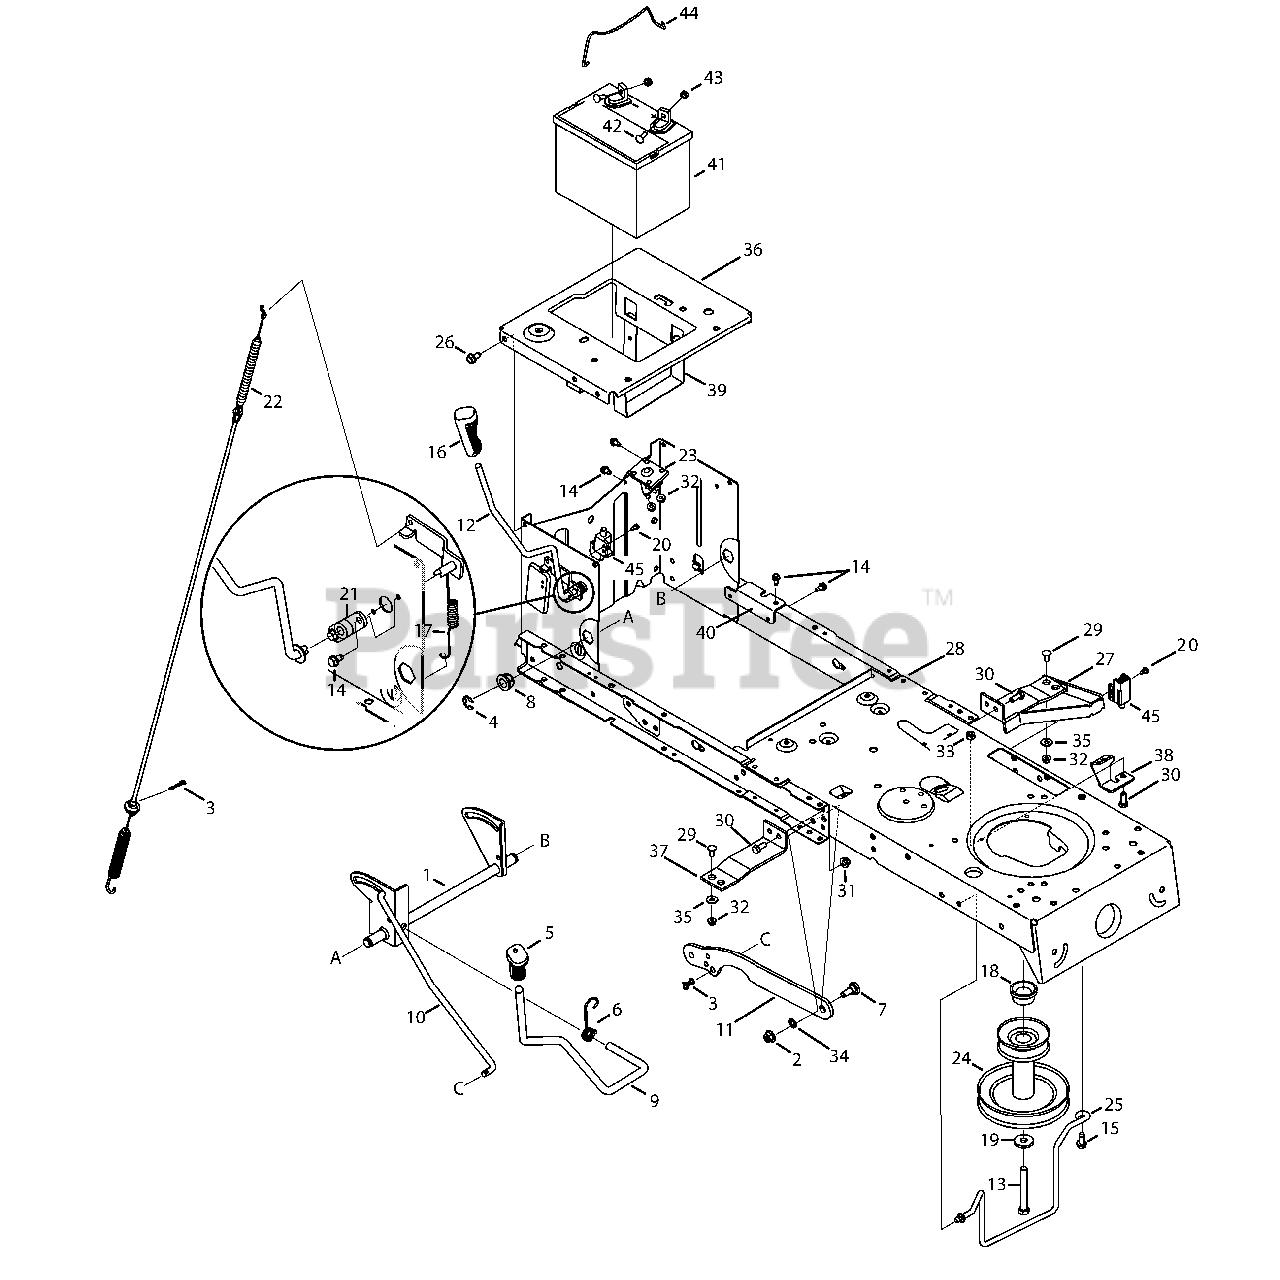 Craftsman 247 13ax79st099